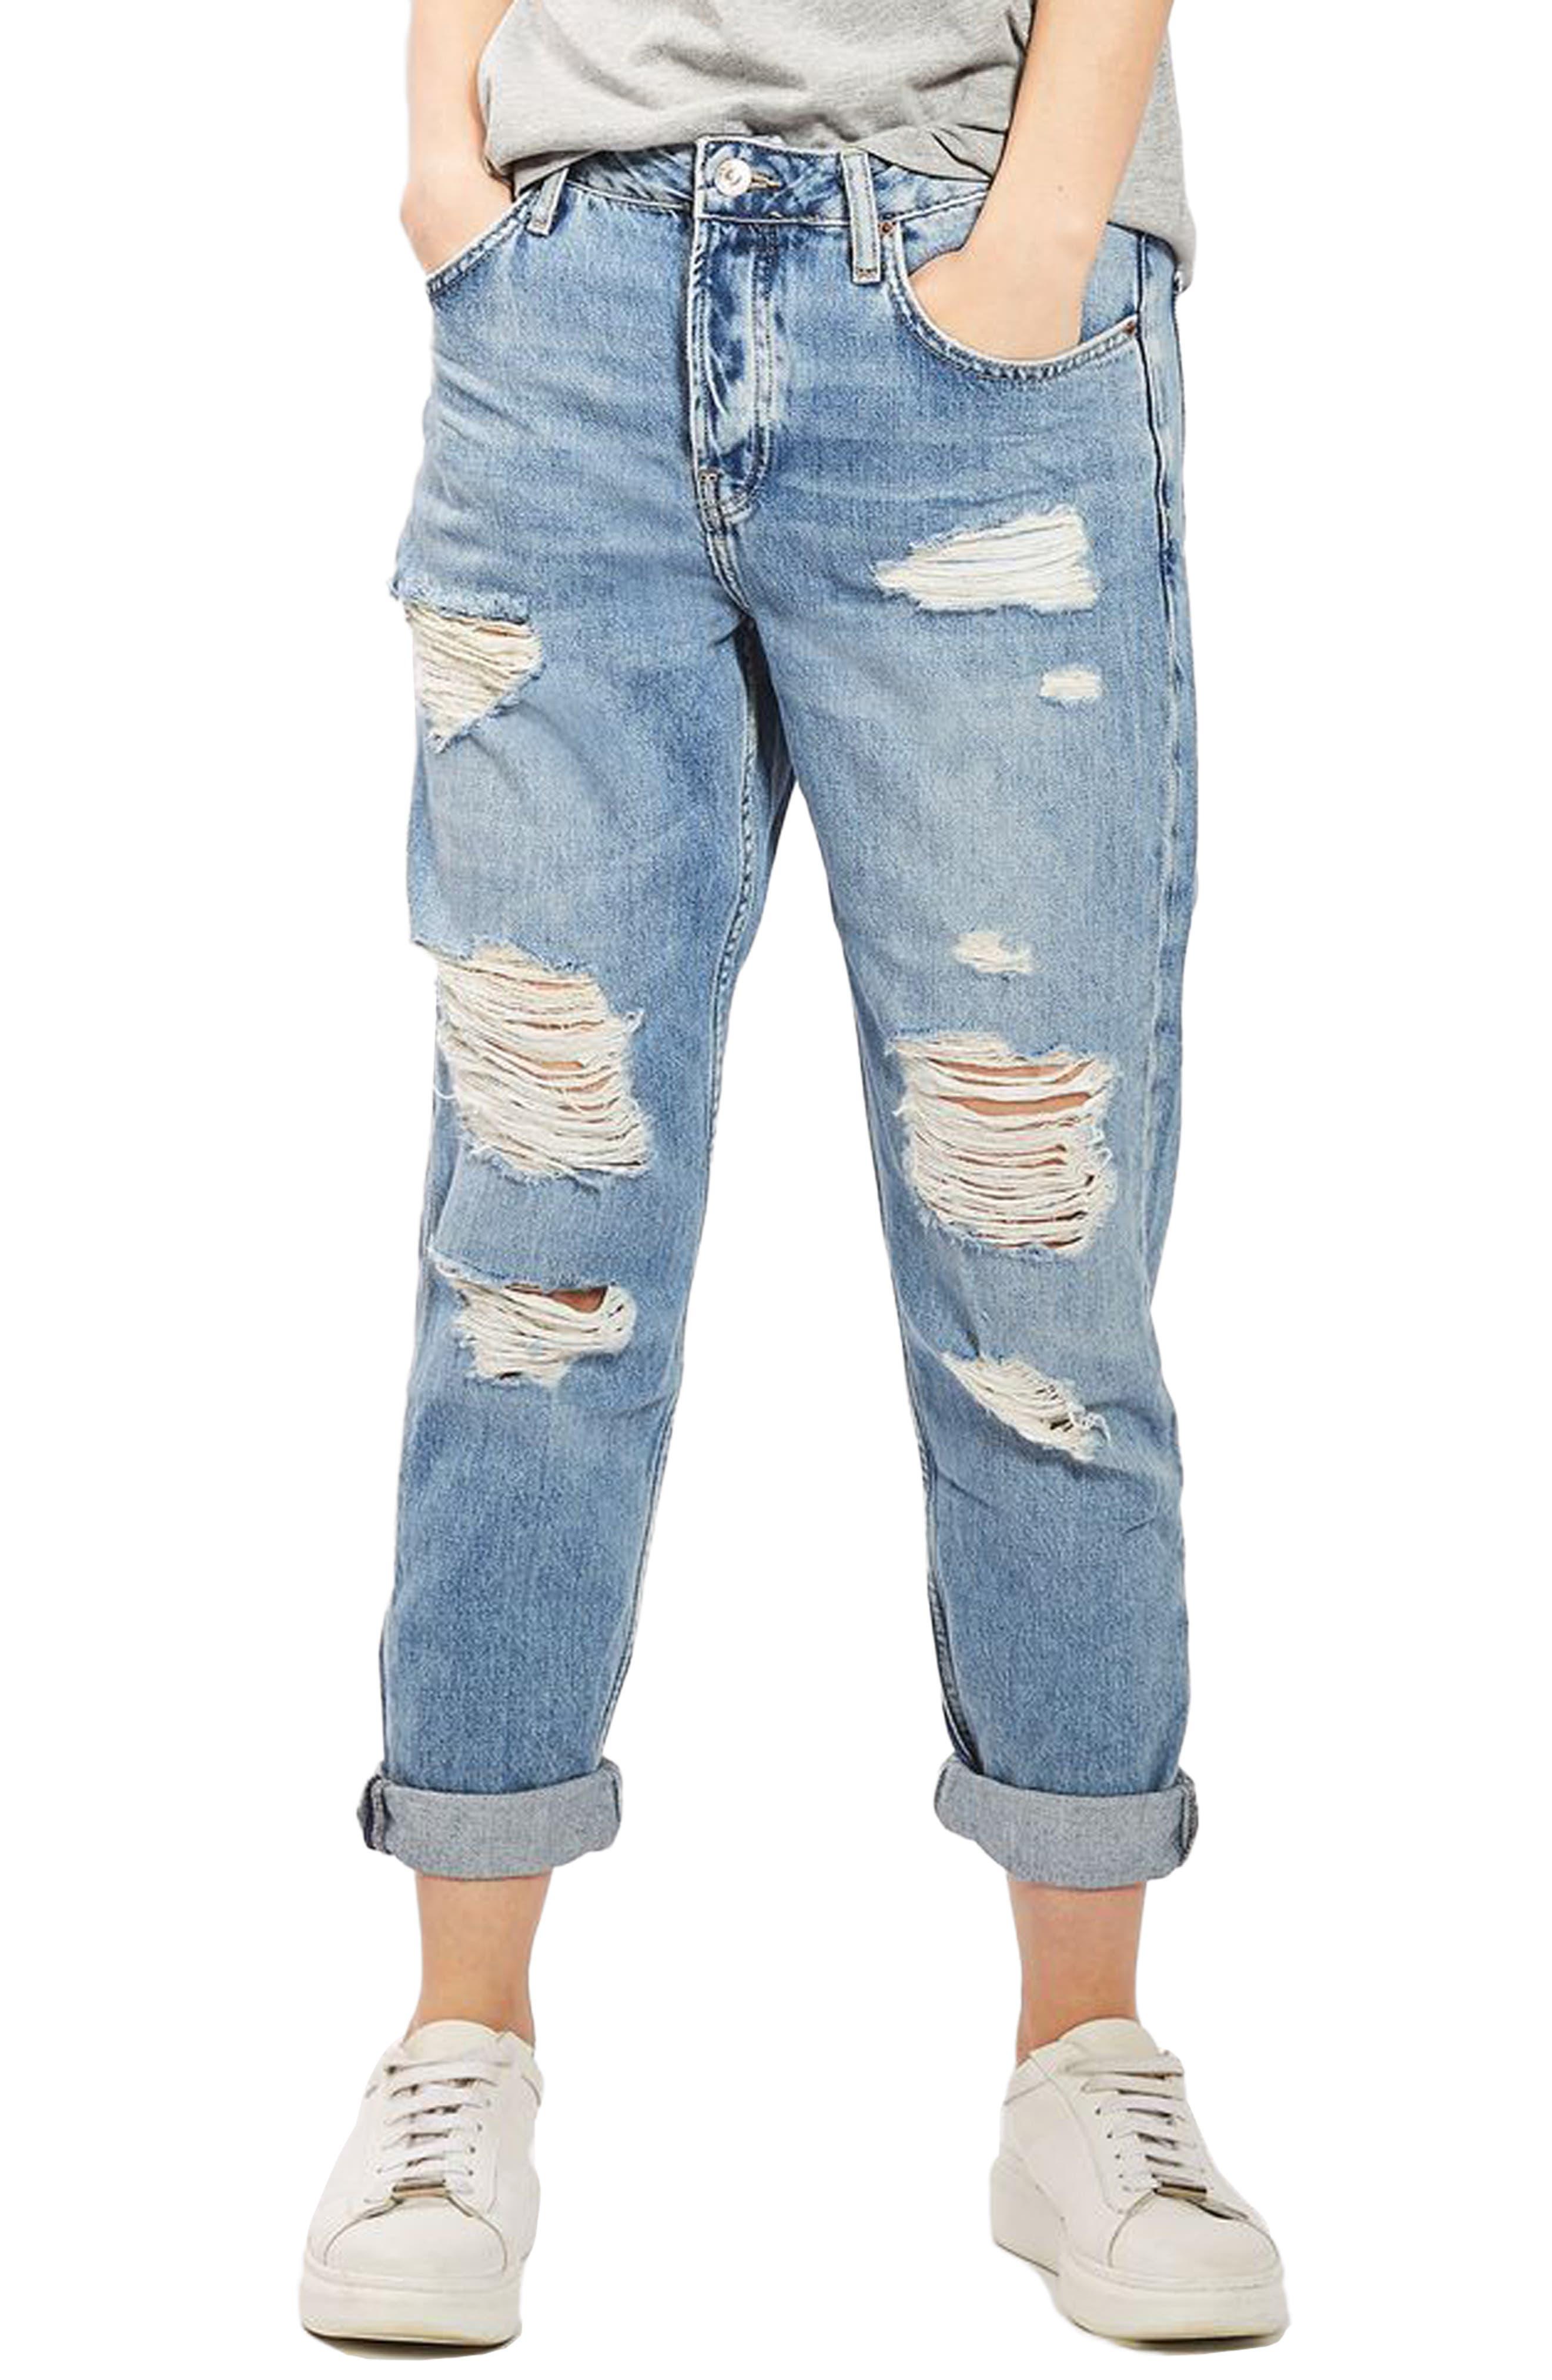 Hayden Super Ripped Boyfriend Jeans,                         Main,                         color, Light Denim